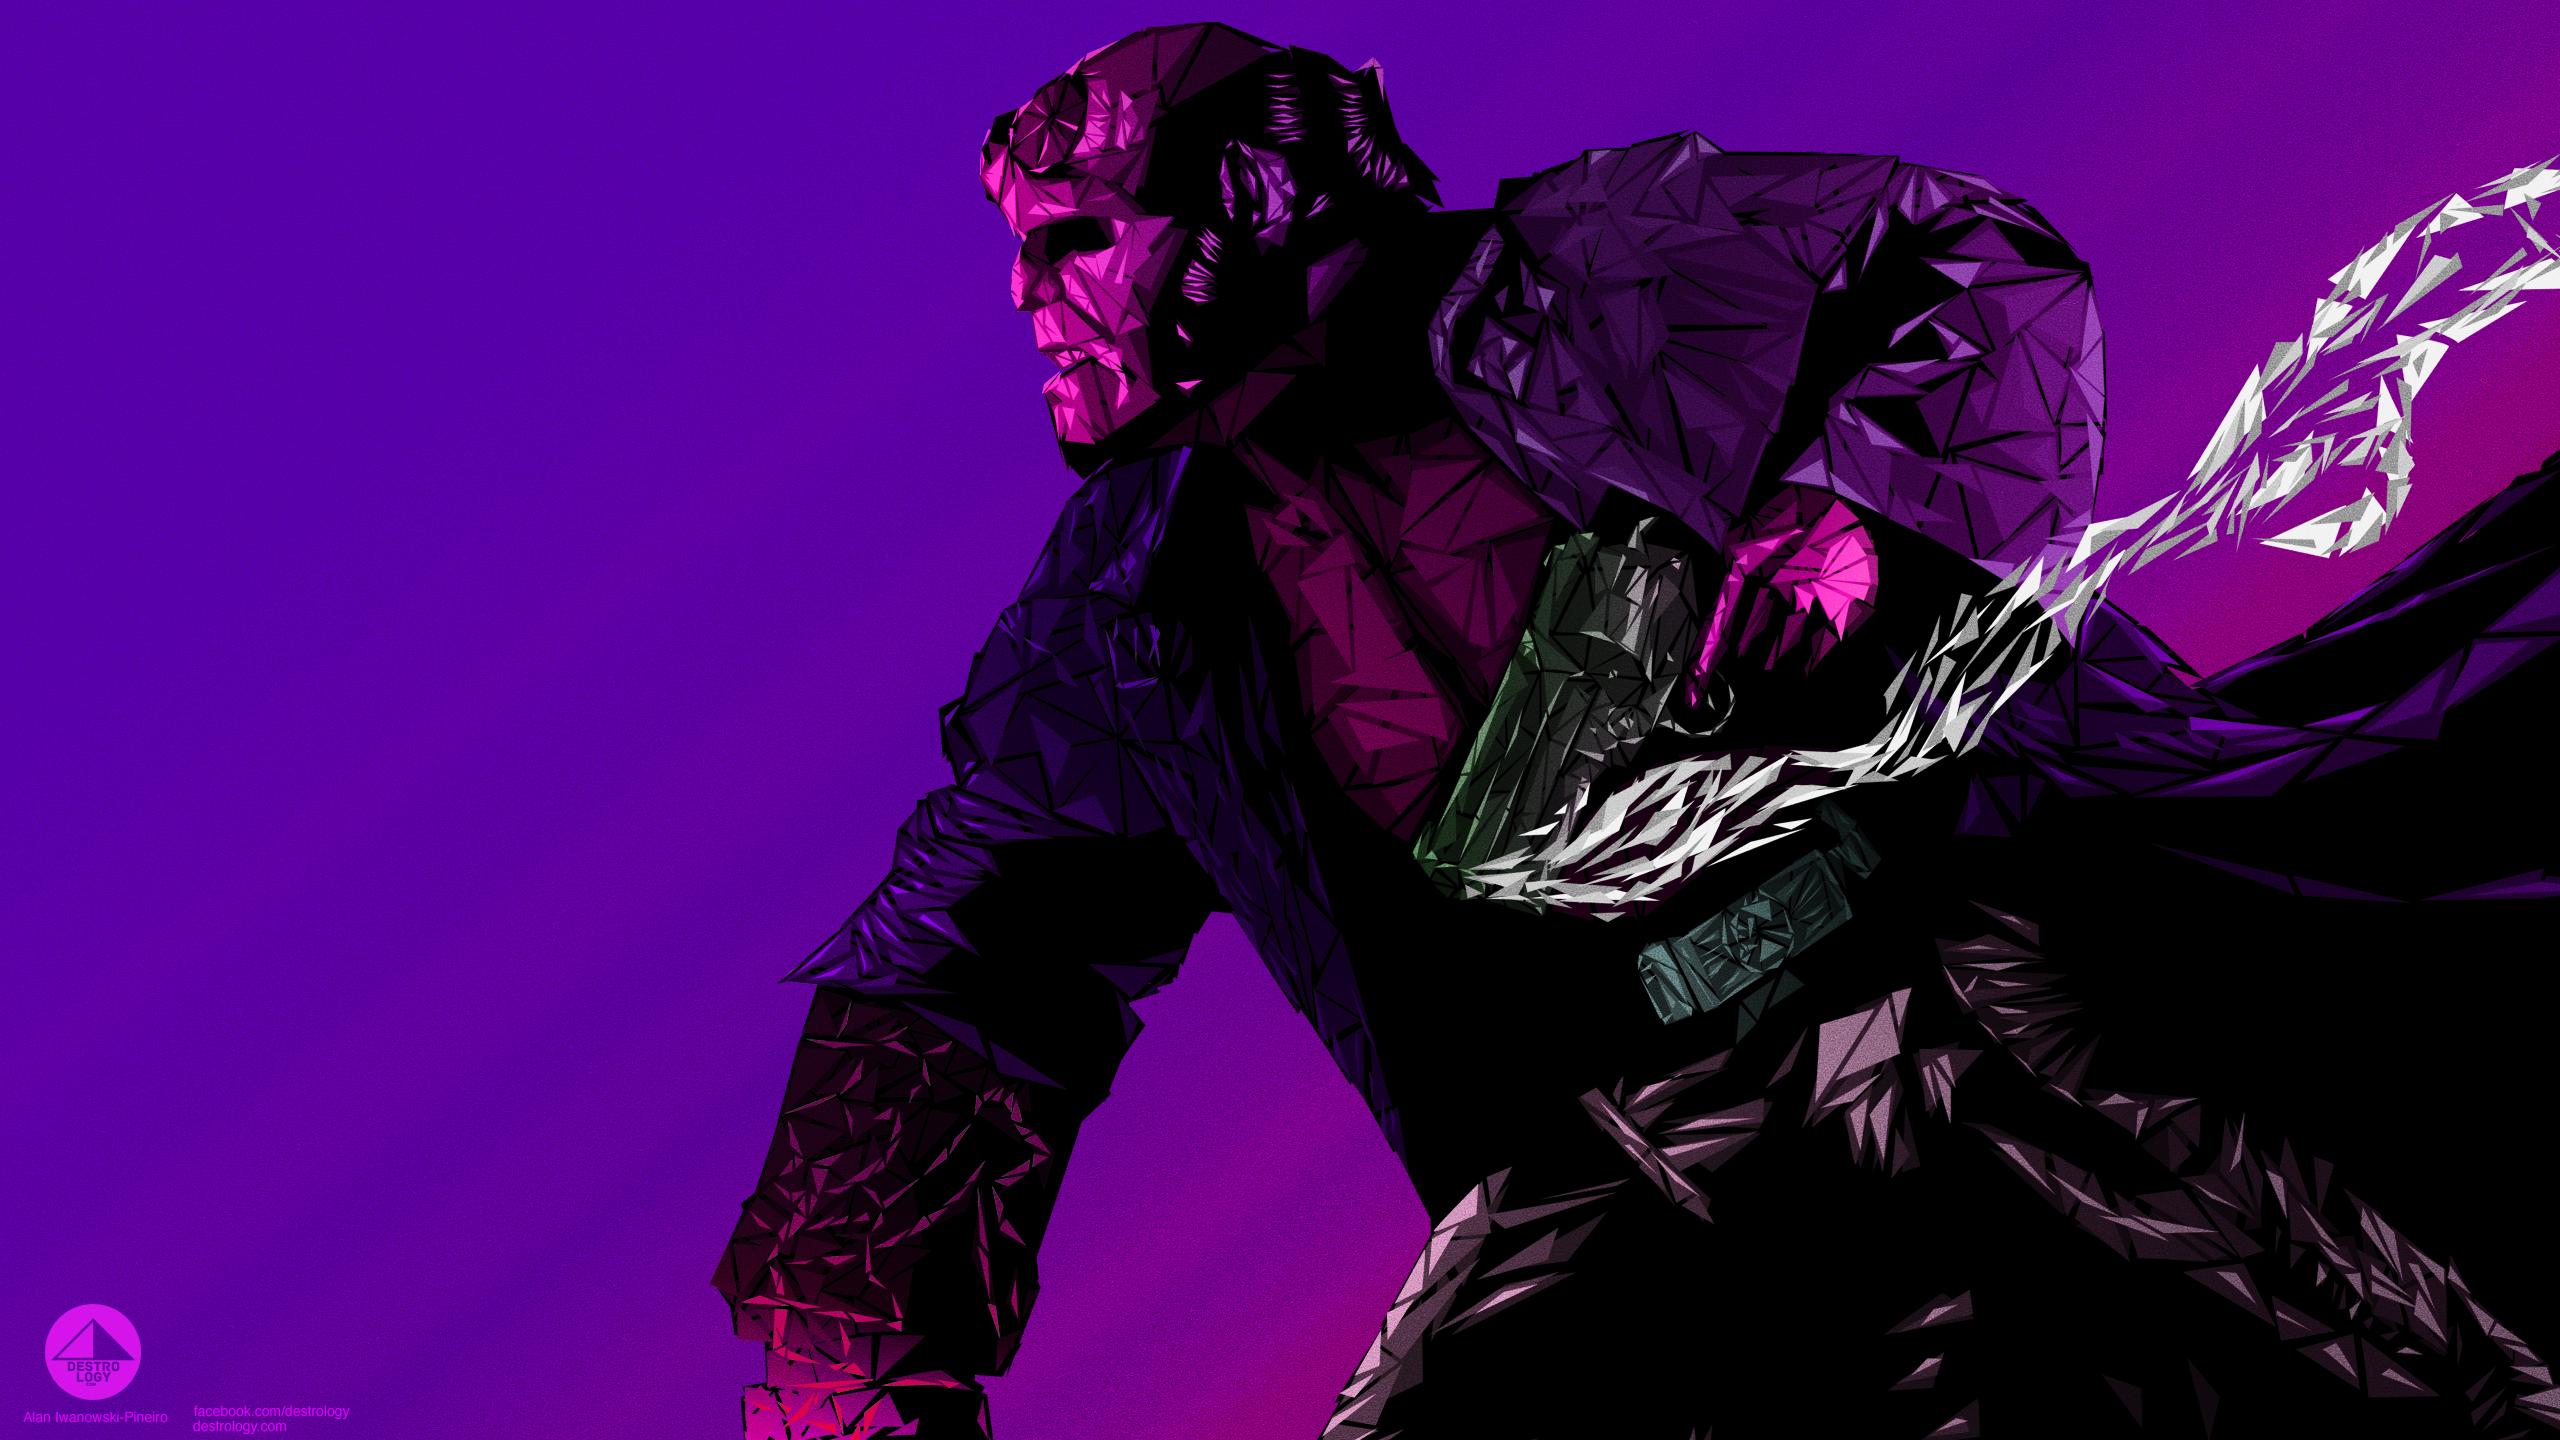 Hellboy Hd Wallpaper Background Image 2560x1440 Id 373326